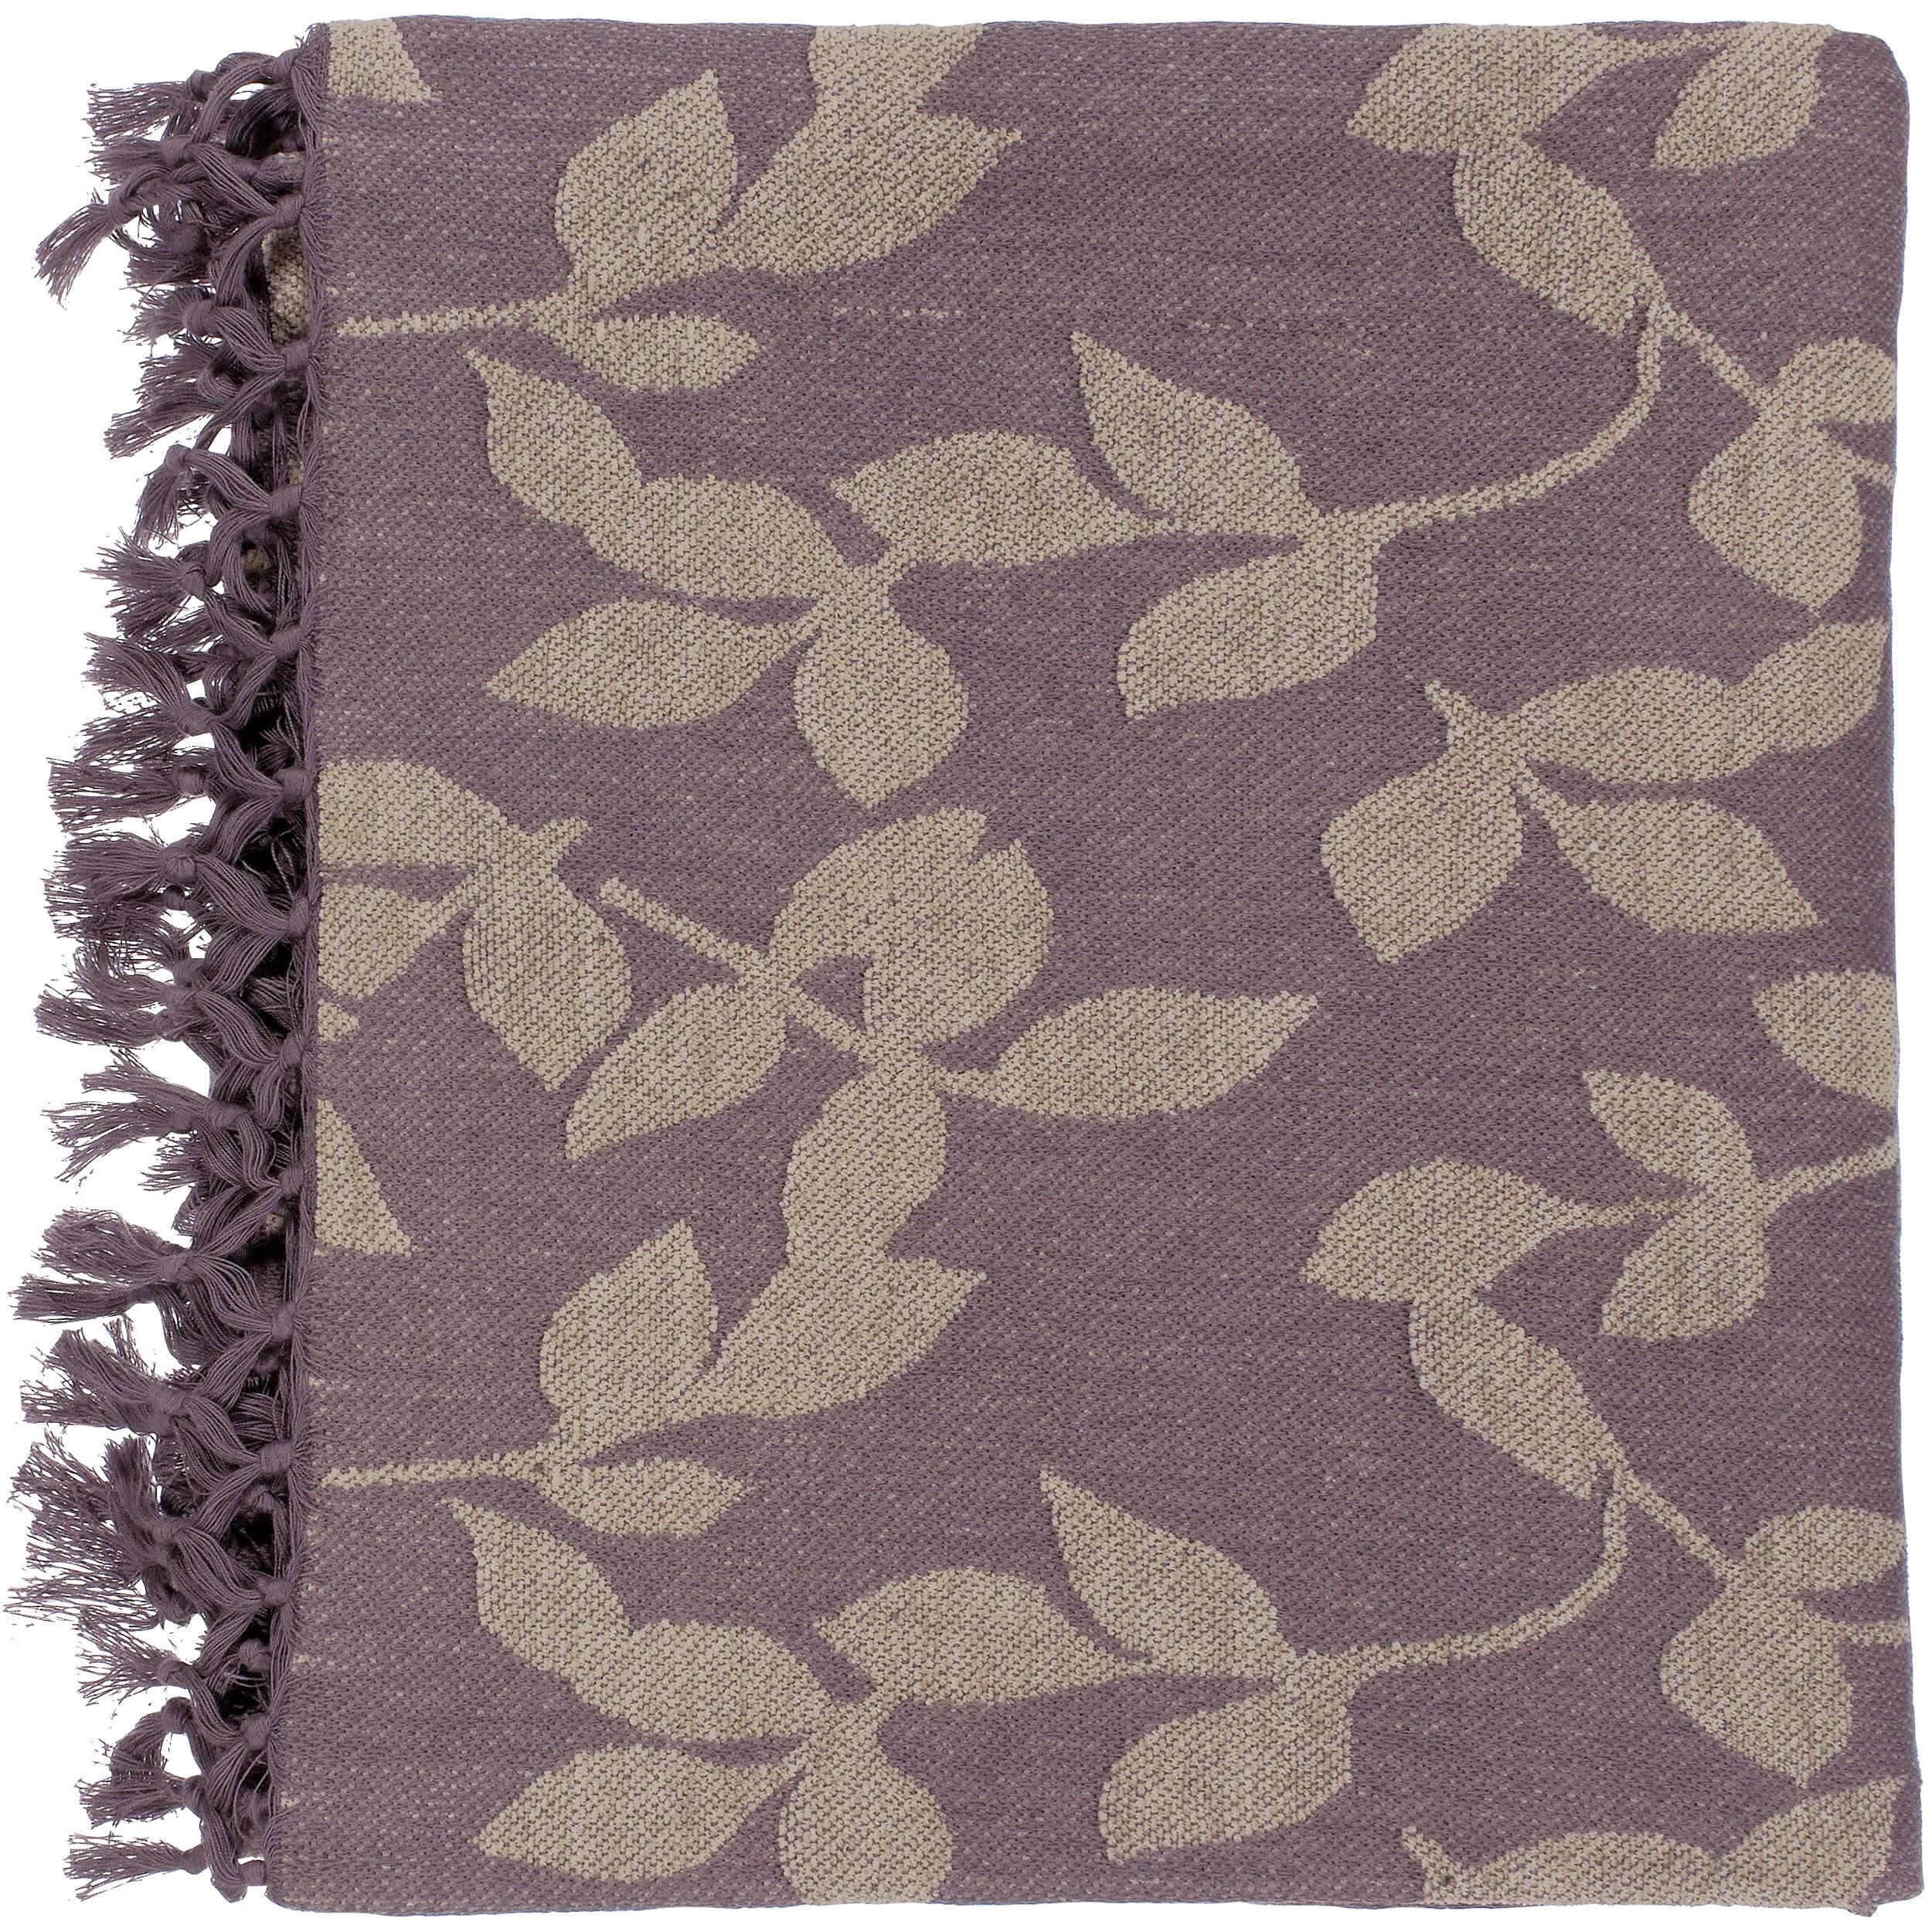 Woven Bengal Cotton Throw